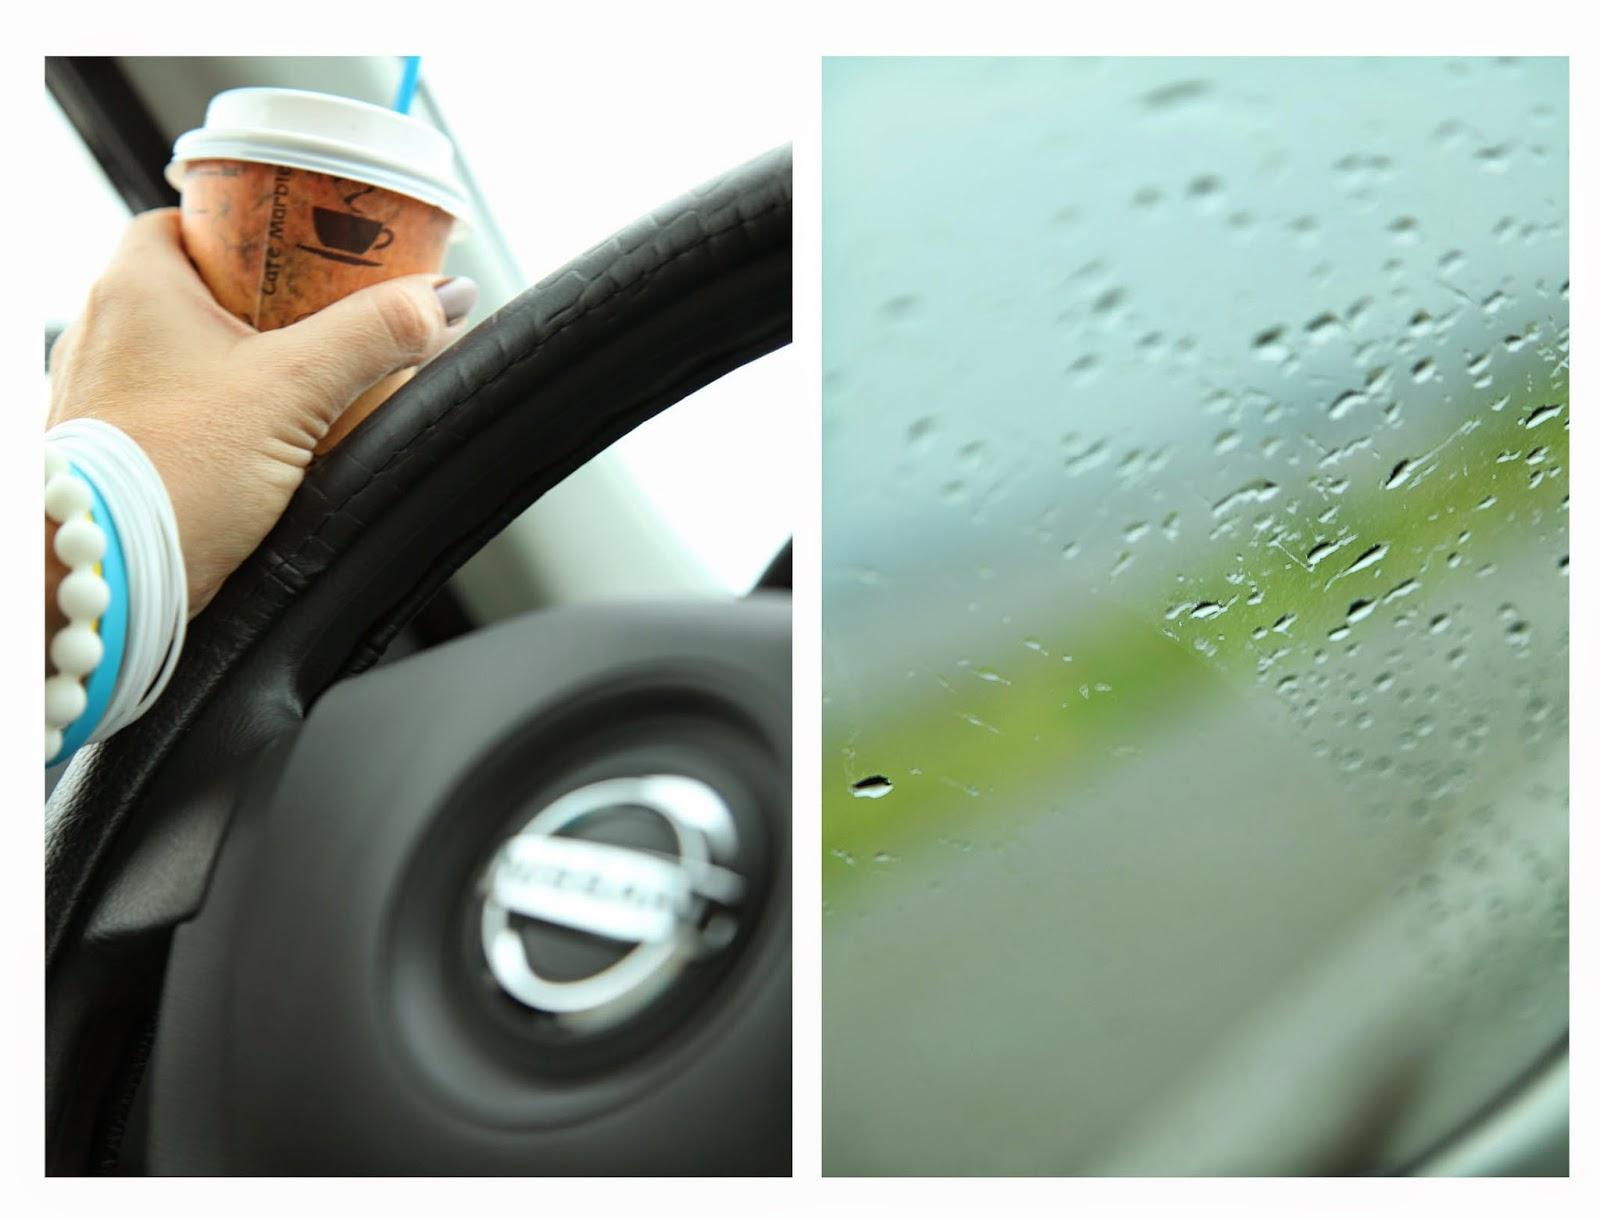 ниссан, дождь, дождик